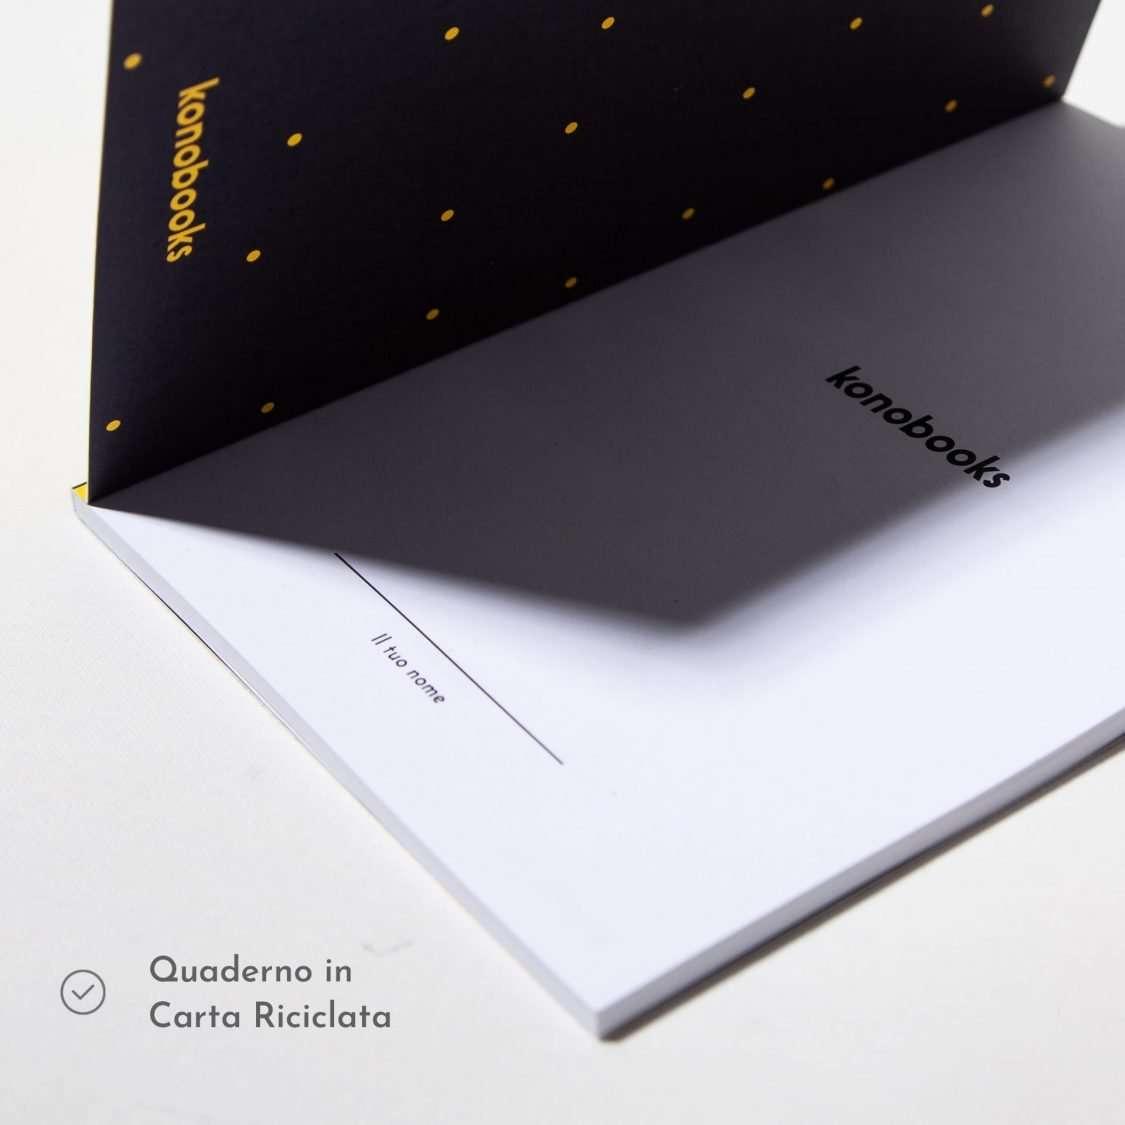 Quaderno plastic free in carta riciclata Konobooks